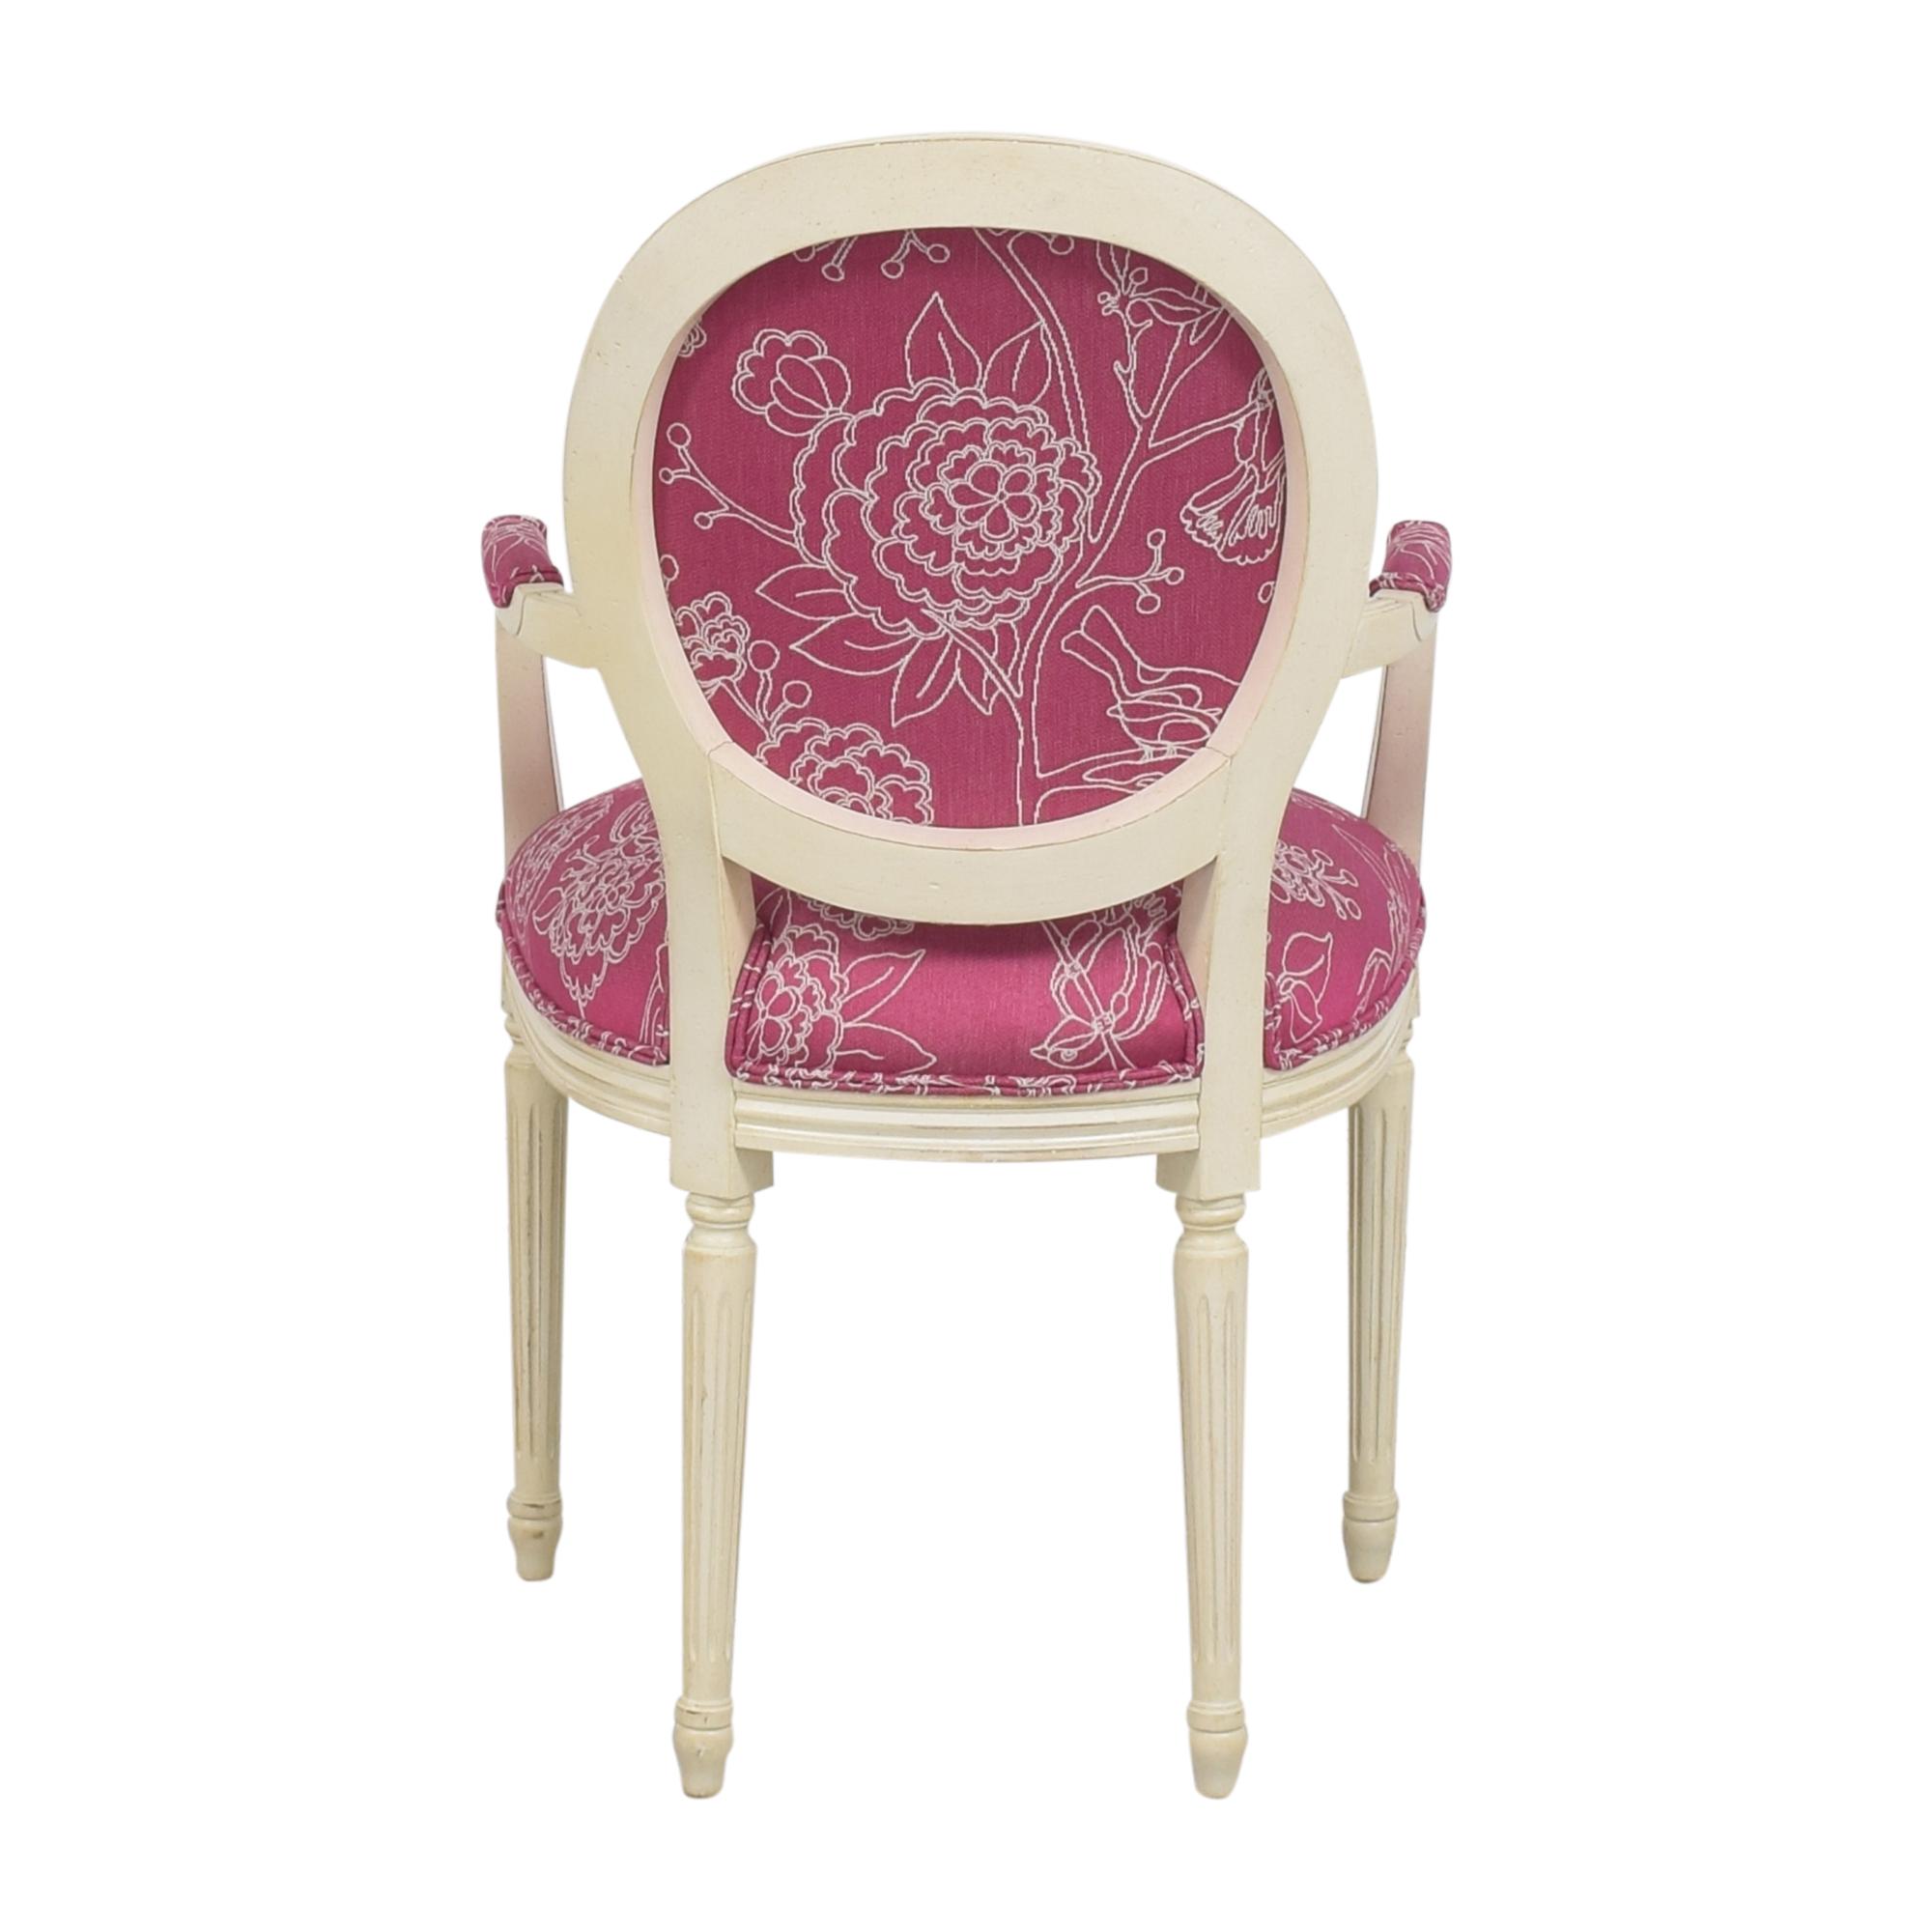 Ethan Allen Josephine Armchair / Chairs